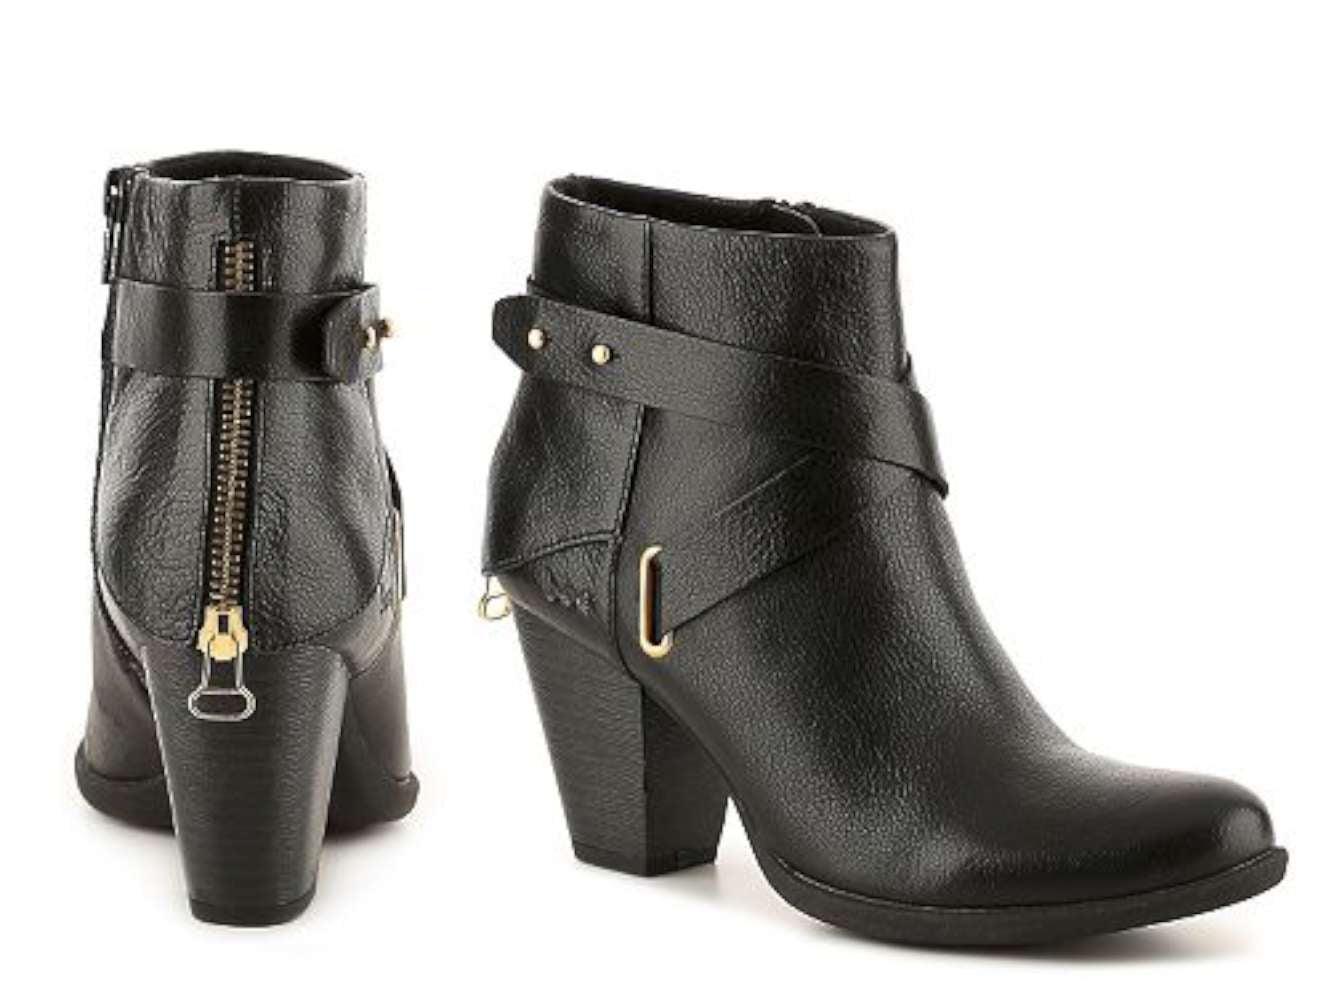 B.O.C Womens Richardson Leather Closed Toe Ankle Fashion Boots